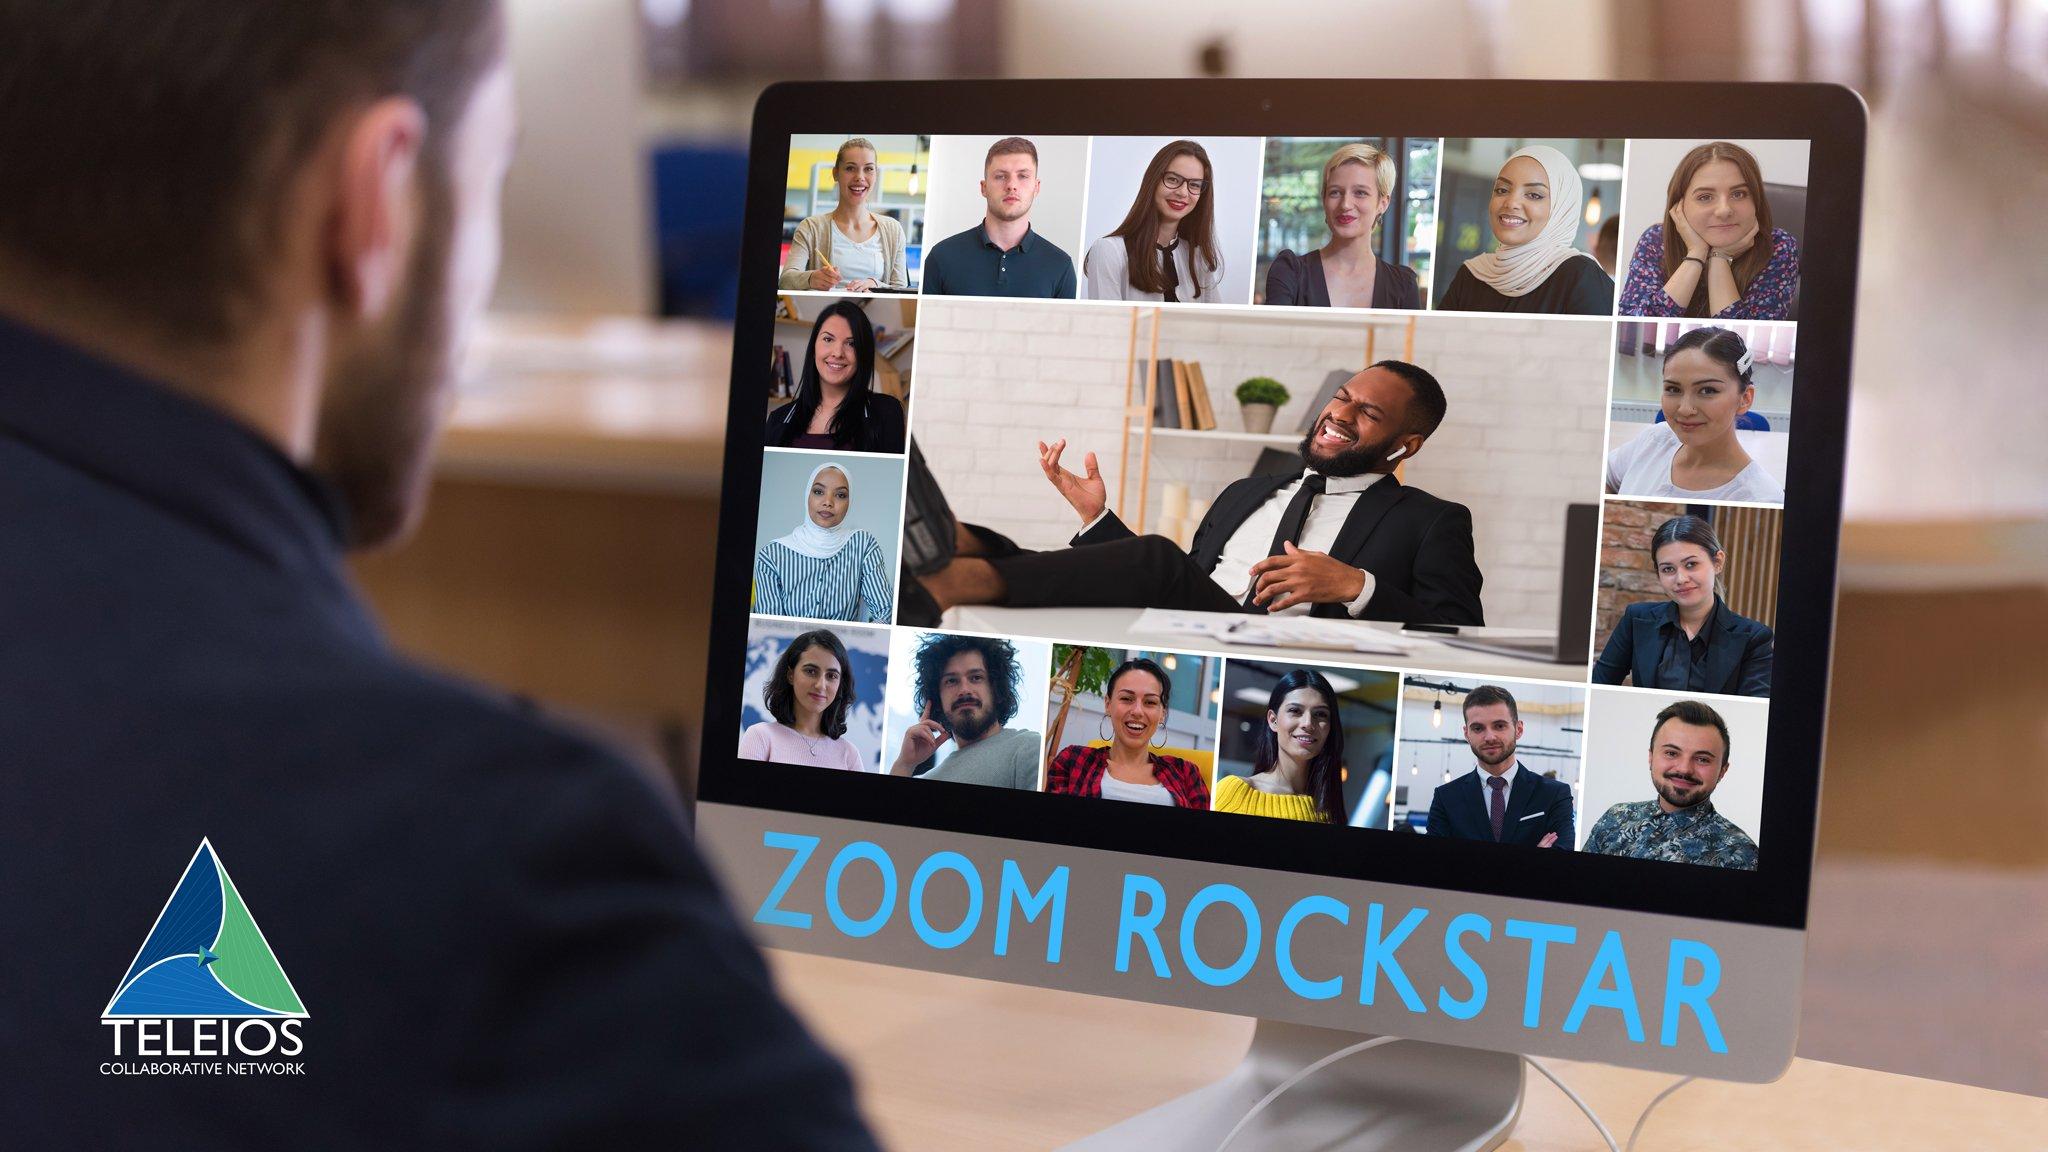 zoomrockstar_main